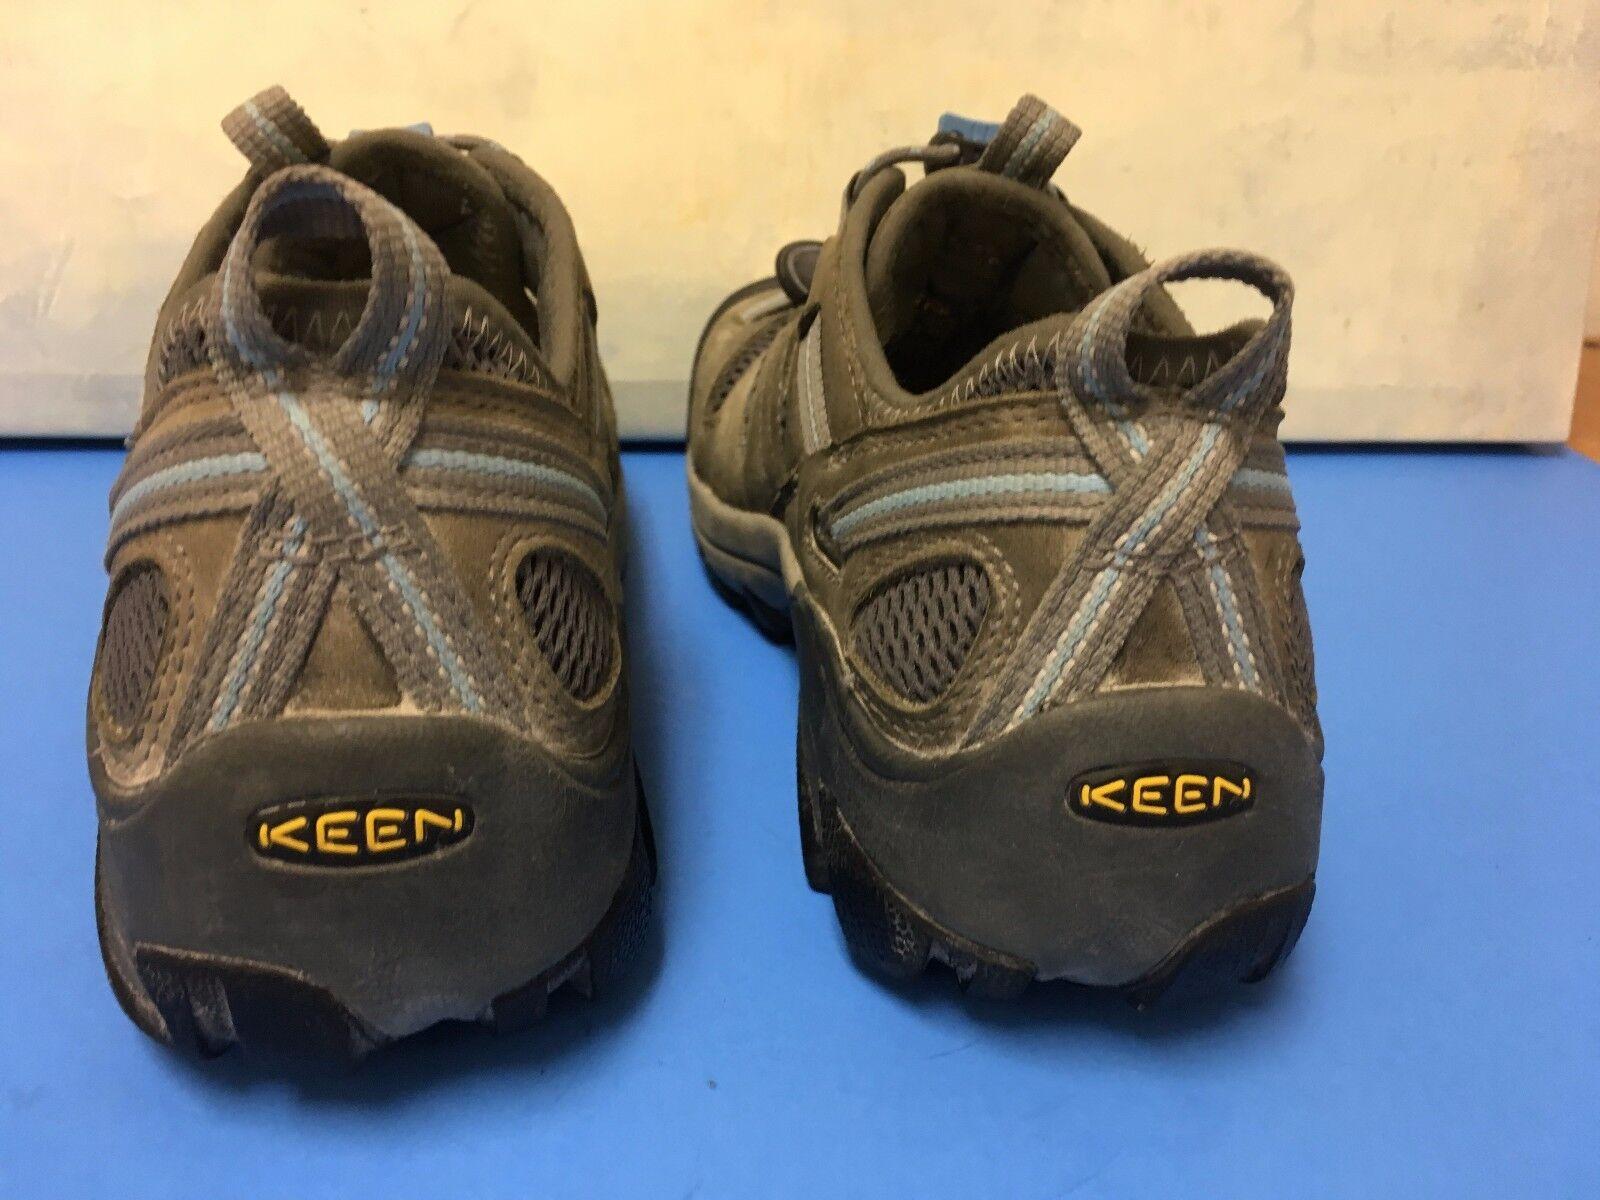 Keen Keen Keen damen Atlanta Cool ESD Steel Toe schuhe Style F2413-11 braun 10 braun 4ce1f2